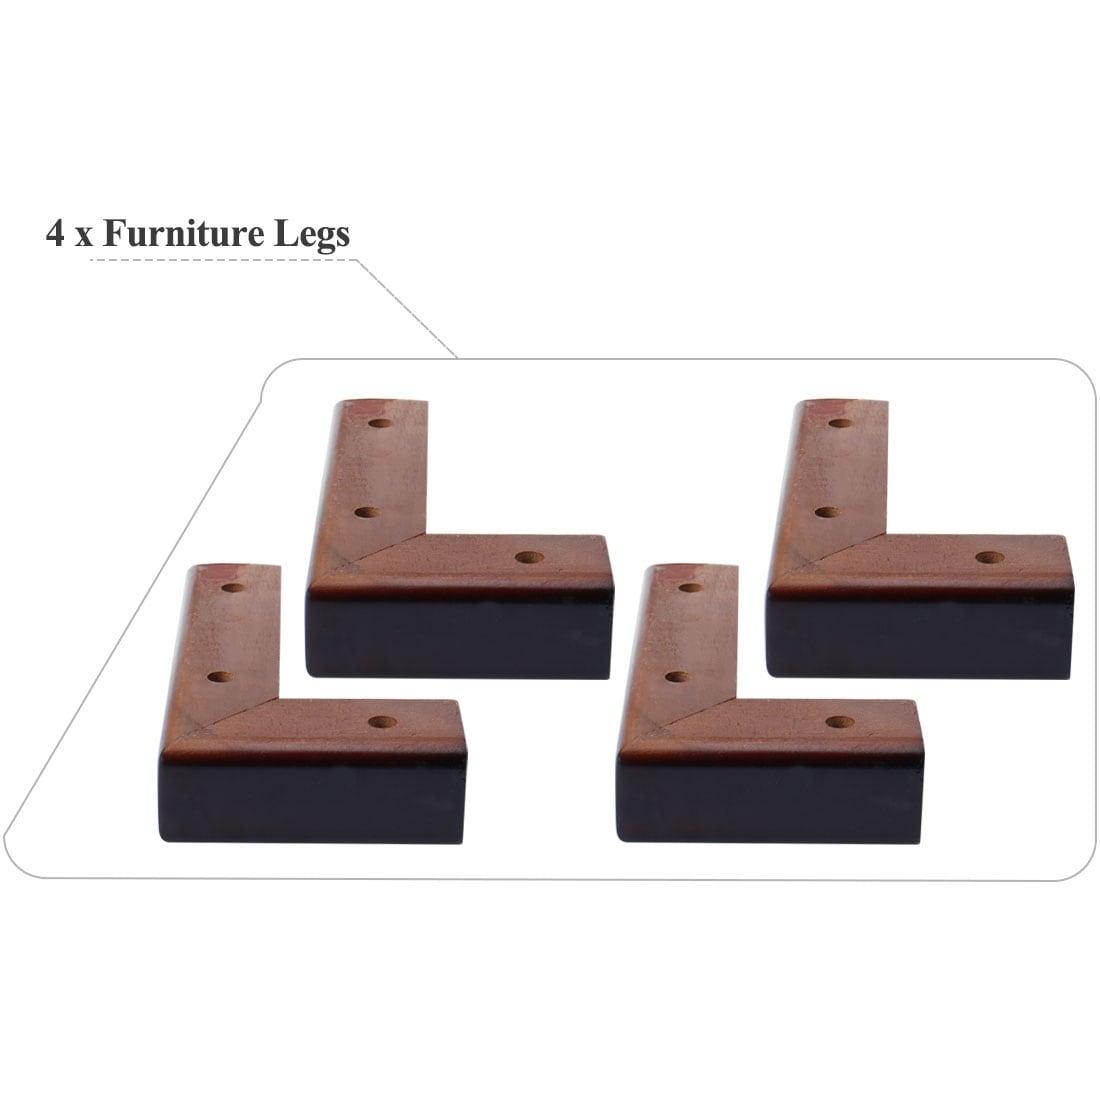 2 x Solid Wooden Furniture Feet Leg Plinth For Divan Bed Sofa Cylinder shape